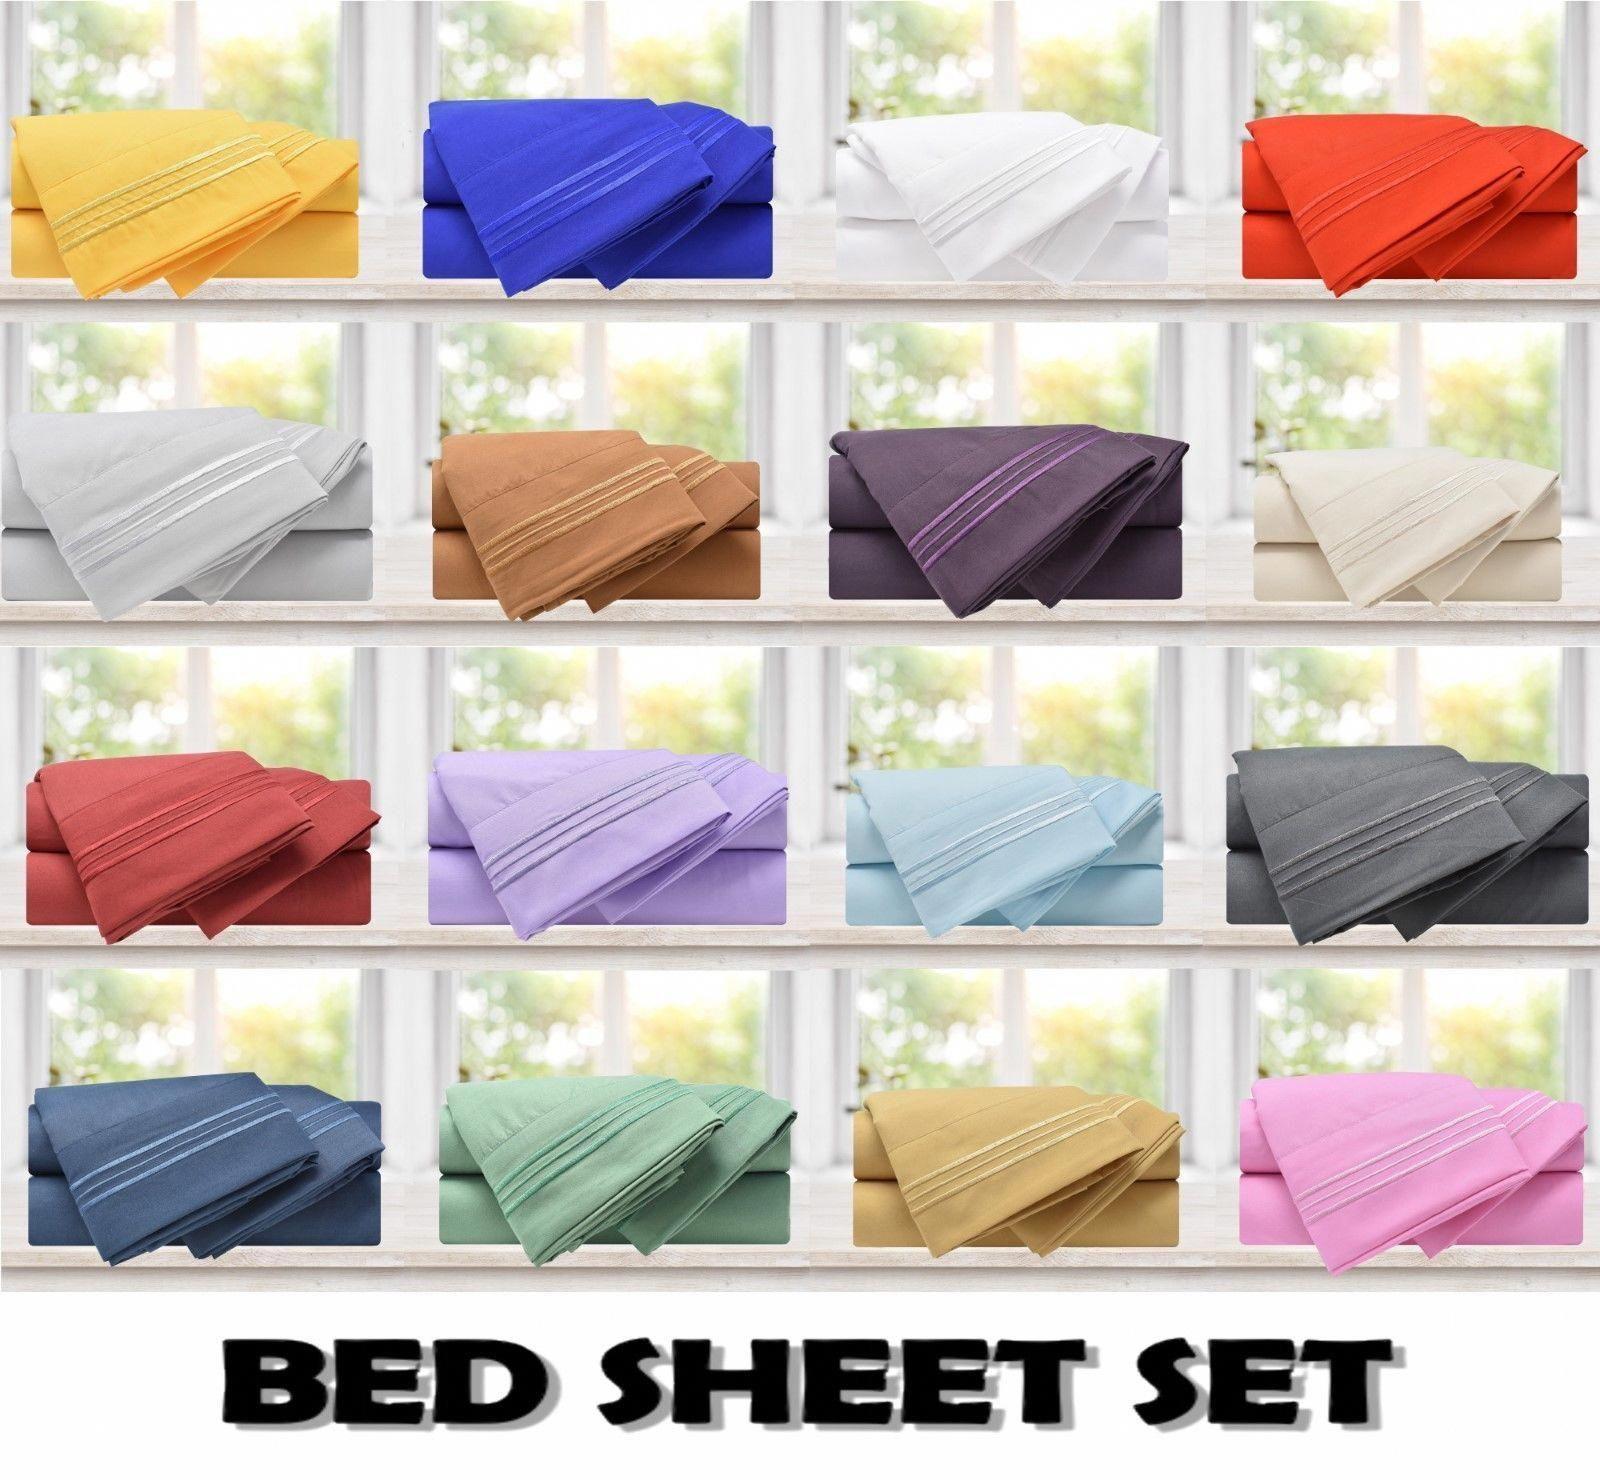 Super Soft And Cozy 1800 Premier High Quality Brushed Microfiber Bed Sheets Set Bedandlinens